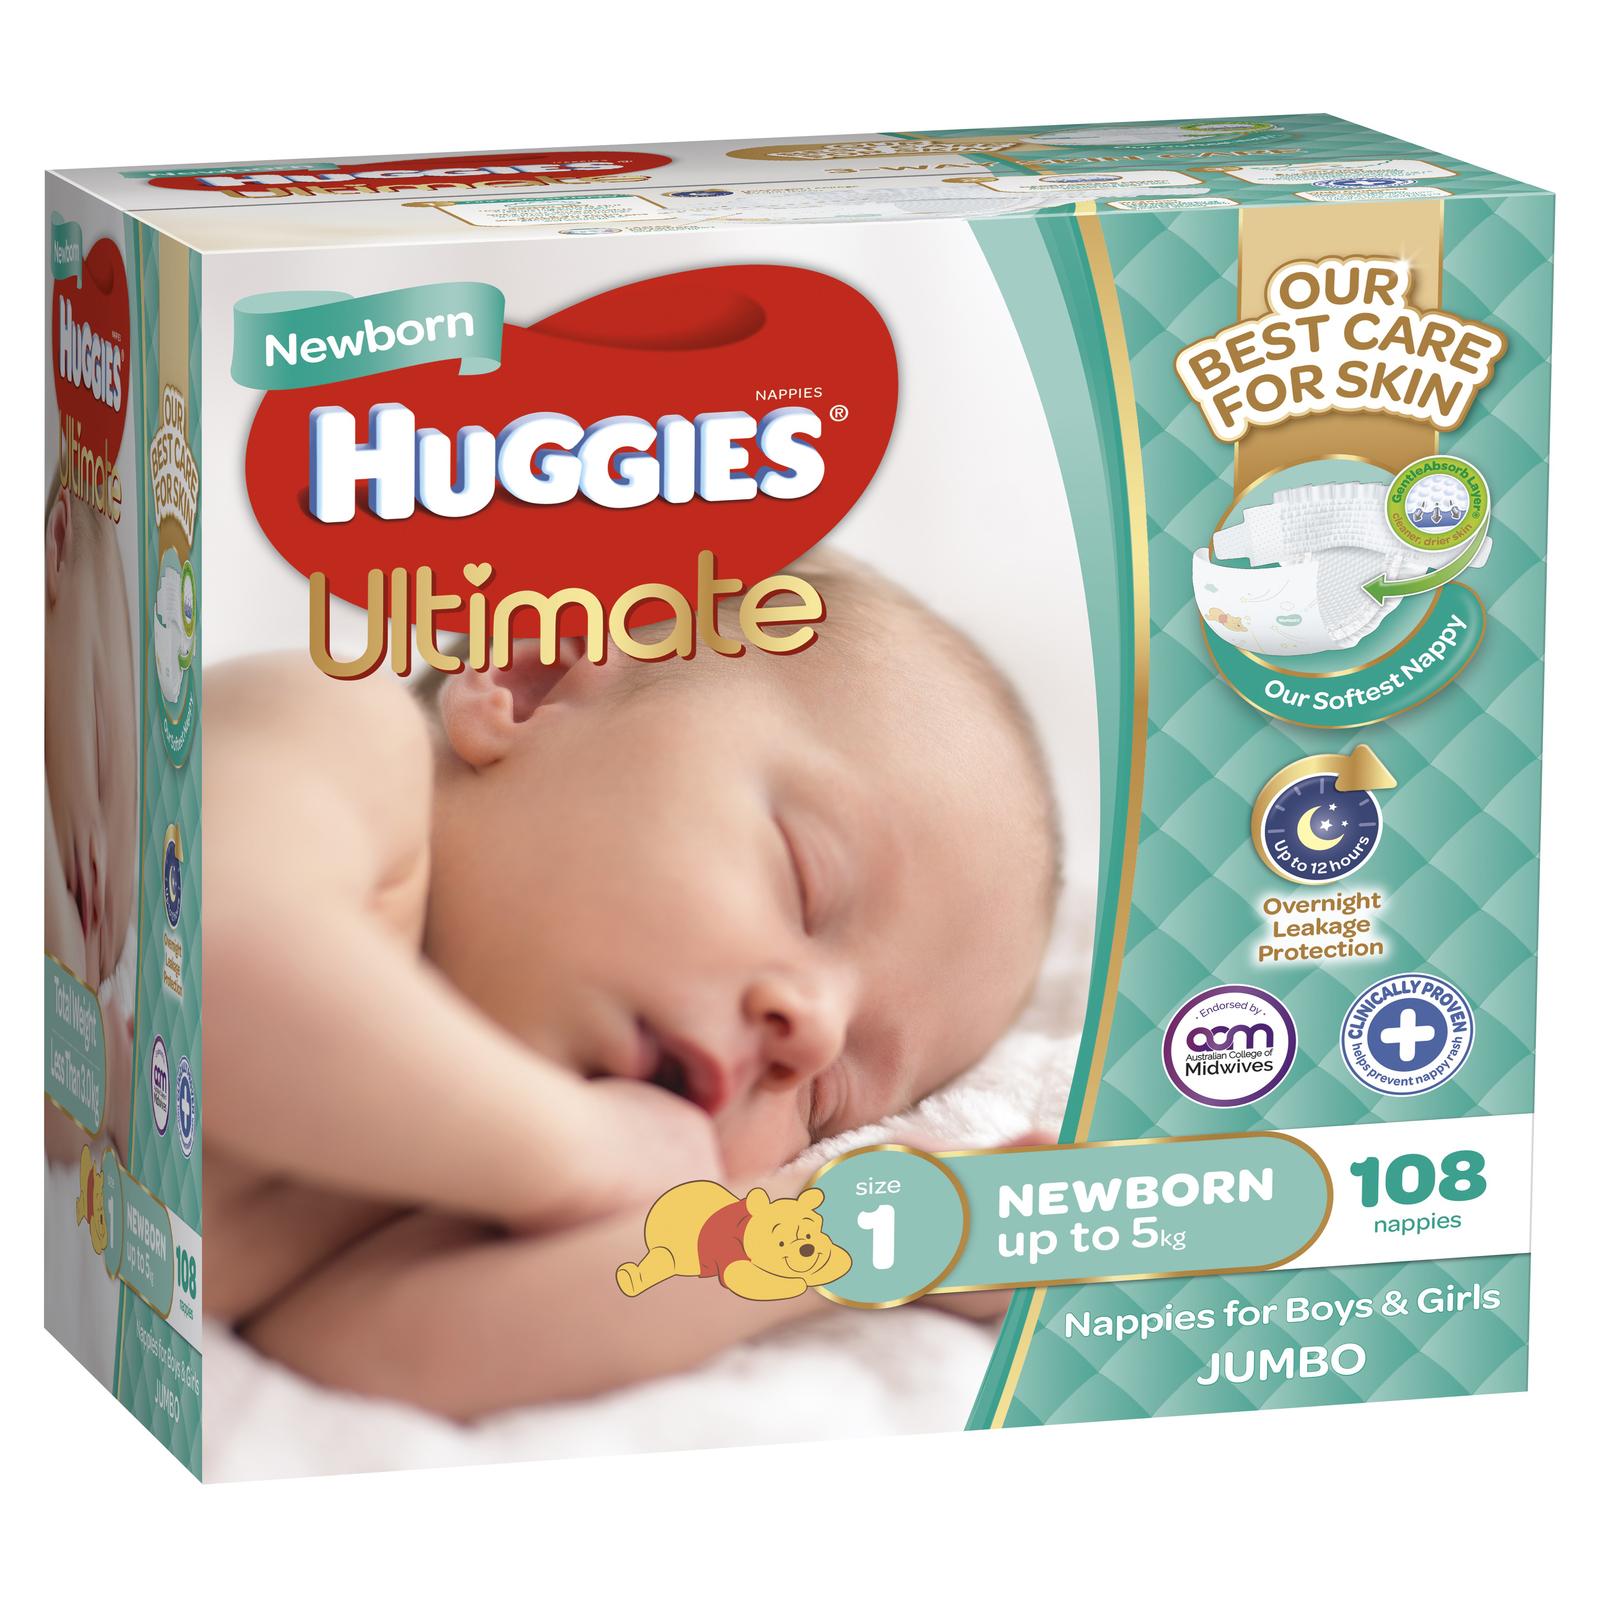 Huggies Ultimate Nappies: Jumbo Pack - Newborn Up to 5kg (108) image